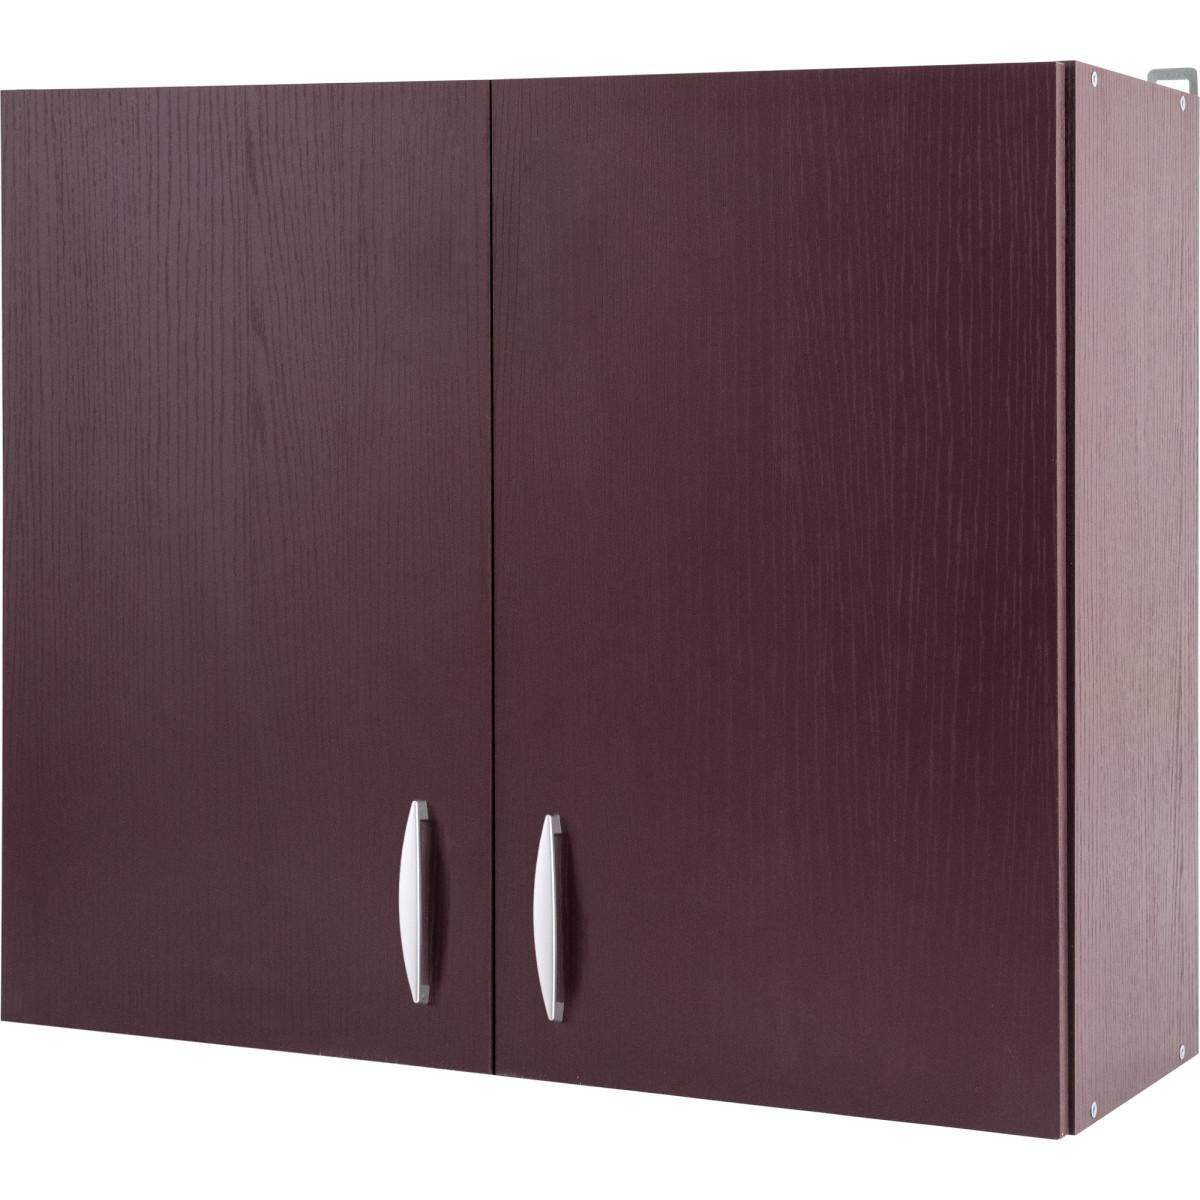 Шкаф навесной Бургун 80x67.6х29 см ЛДСП цвет бургун